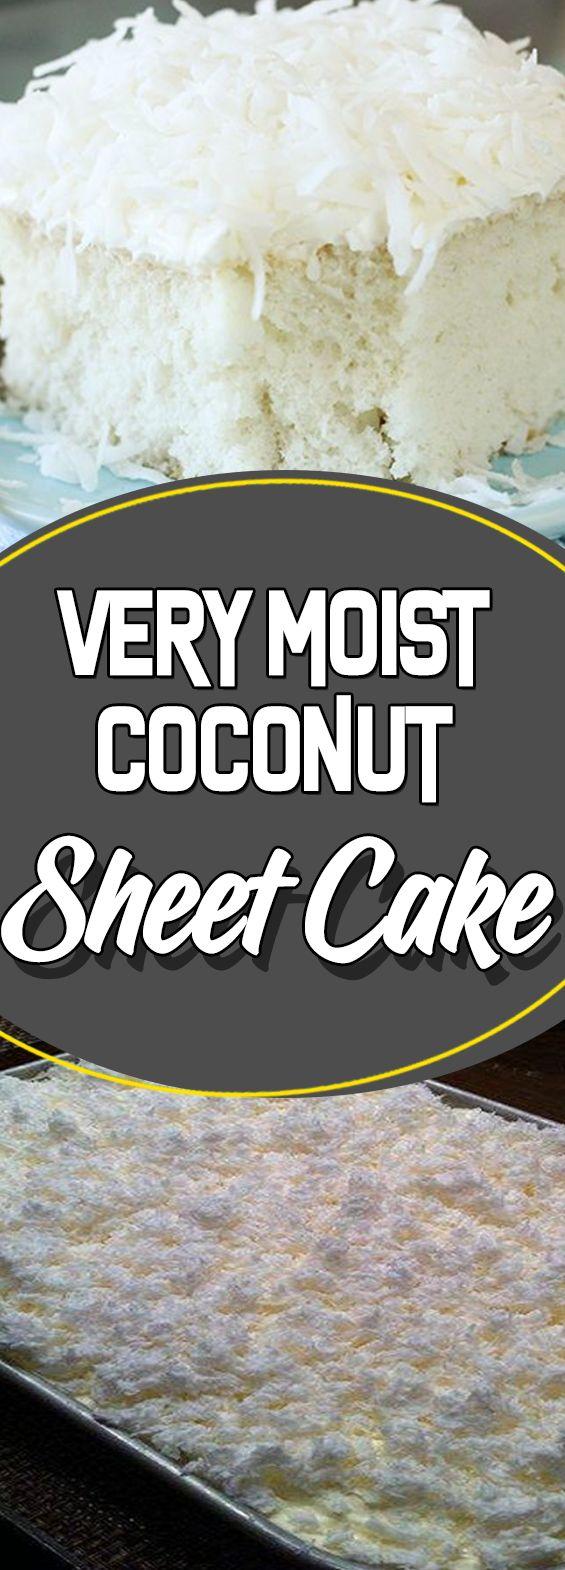 Very Moist Coconut Sheet Cake #appetizer #recipeideas #recipes #dessert #dessertrecipes #desserttable